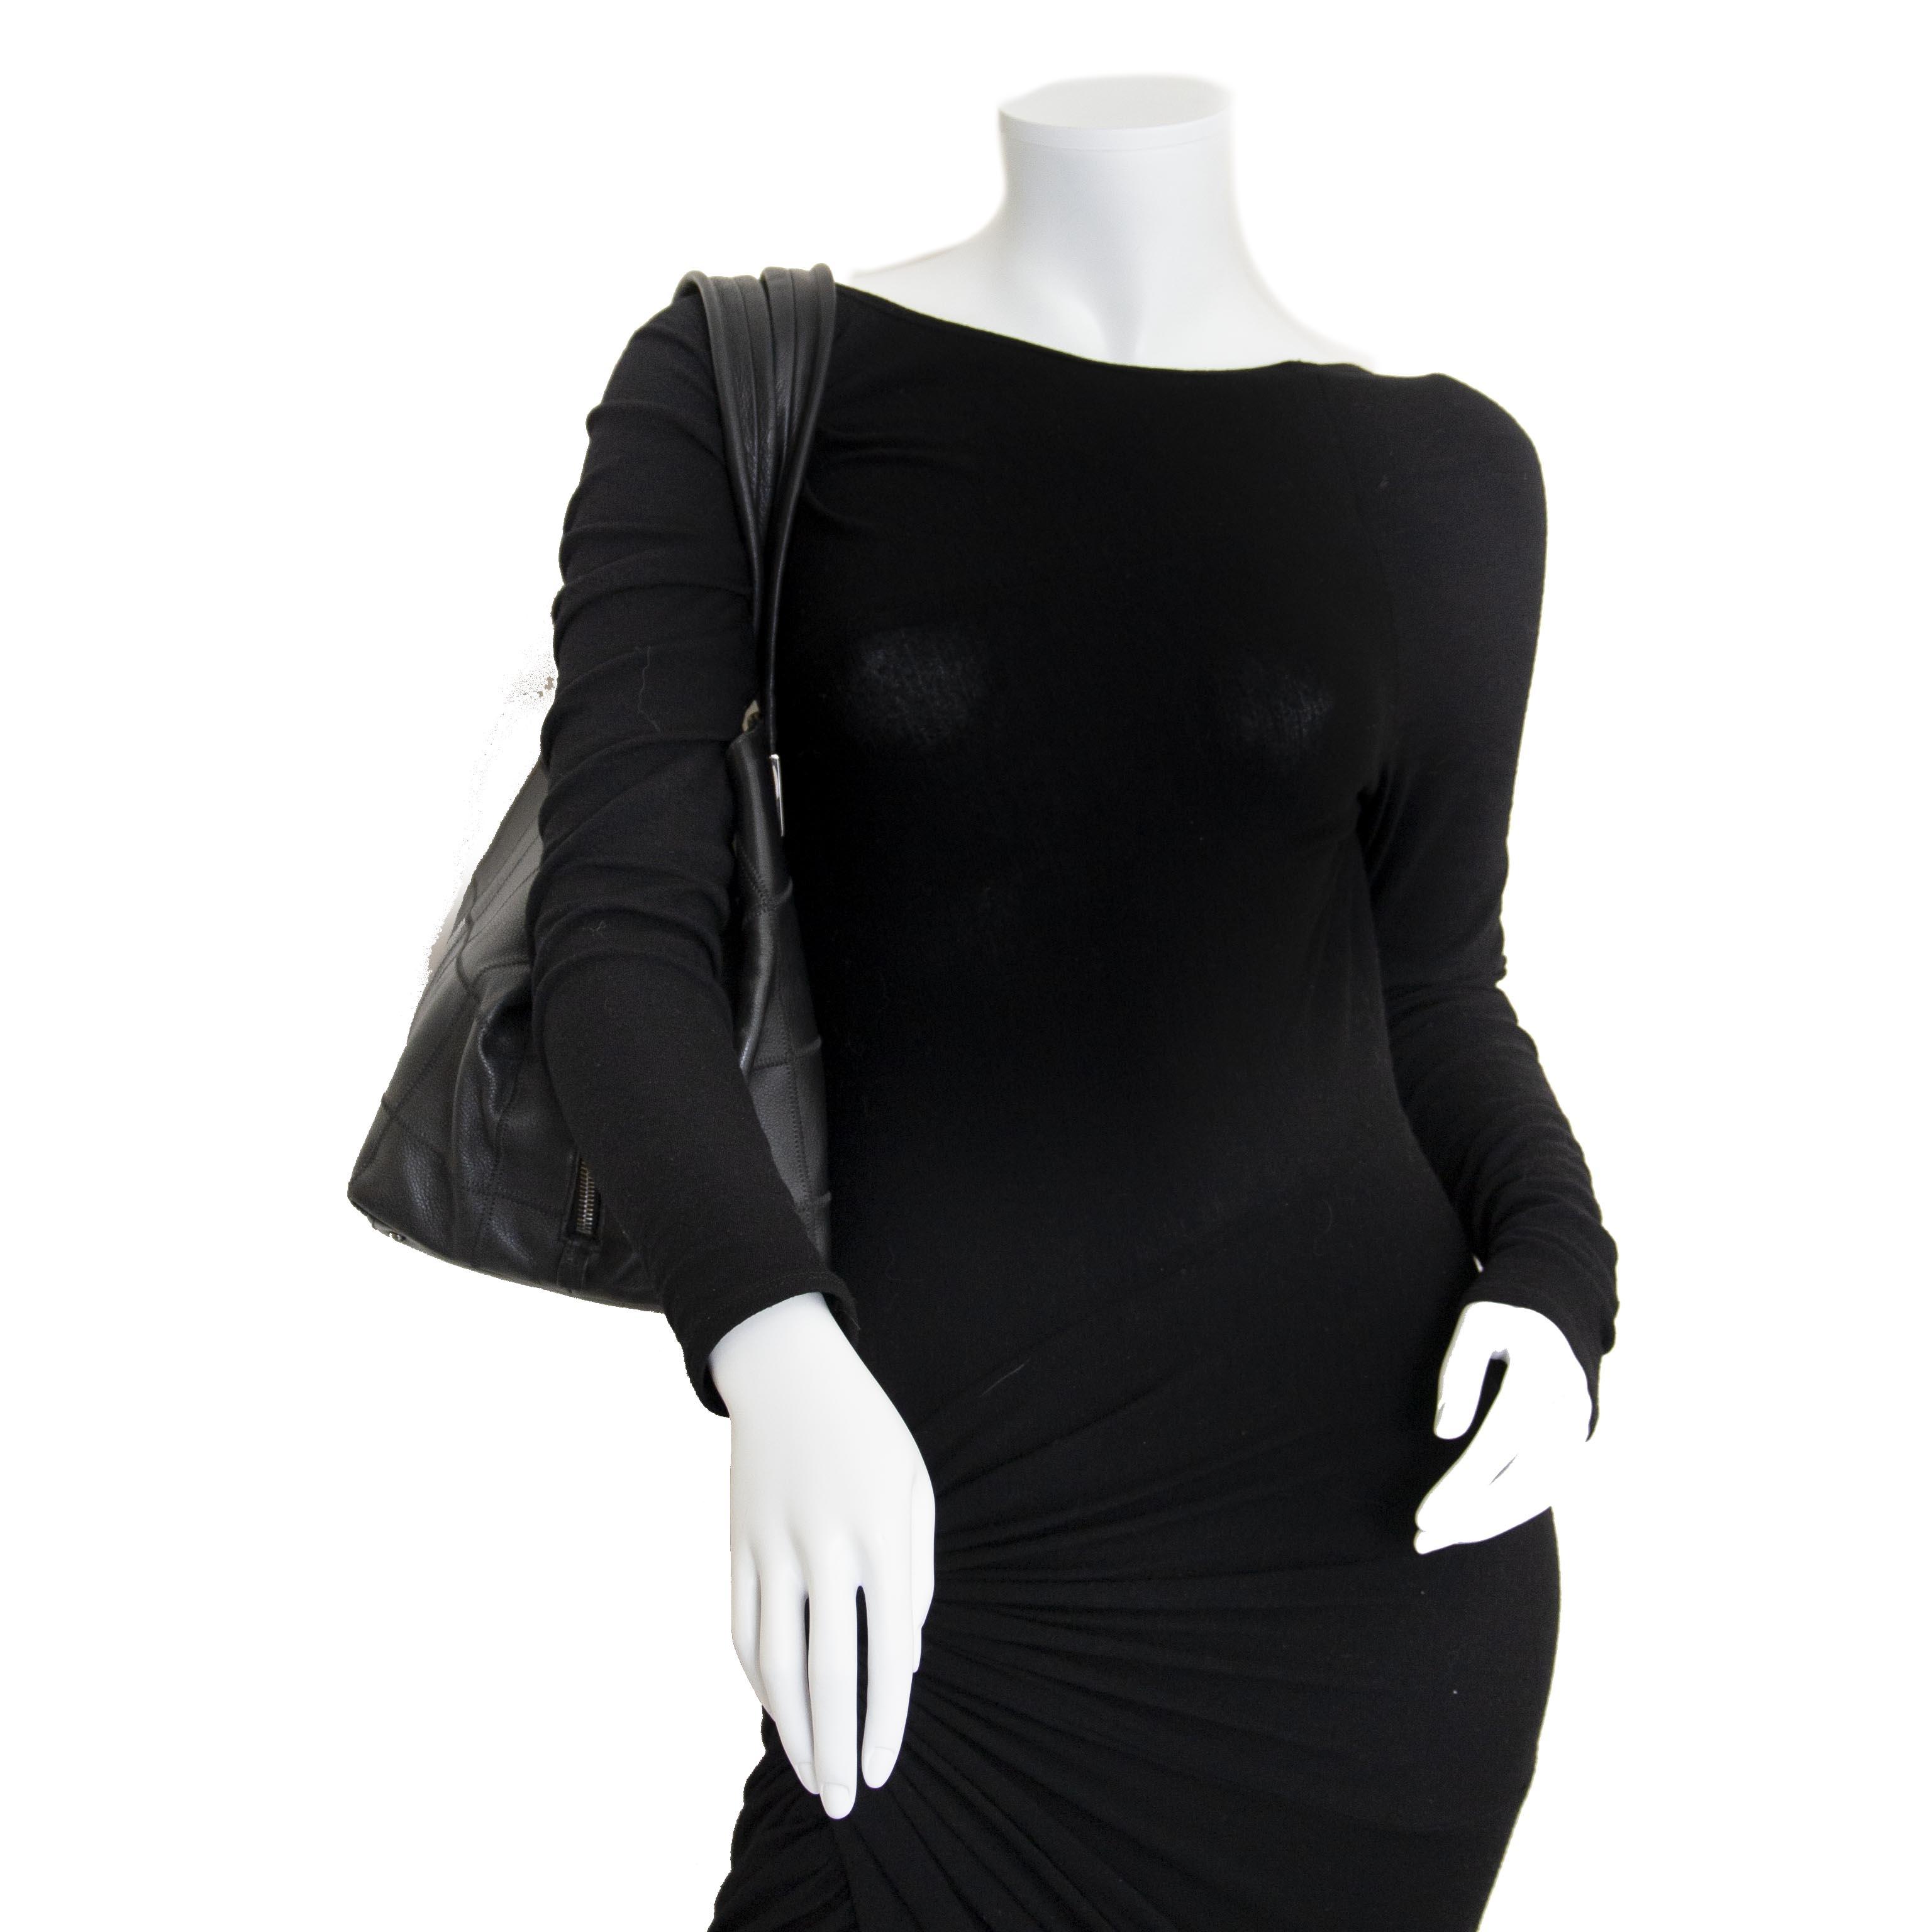 a7aa3858efd9 ... Chanel Le Square Stitch Shoulder Bag now for sale at labellov vintage  fashion webshop belgium